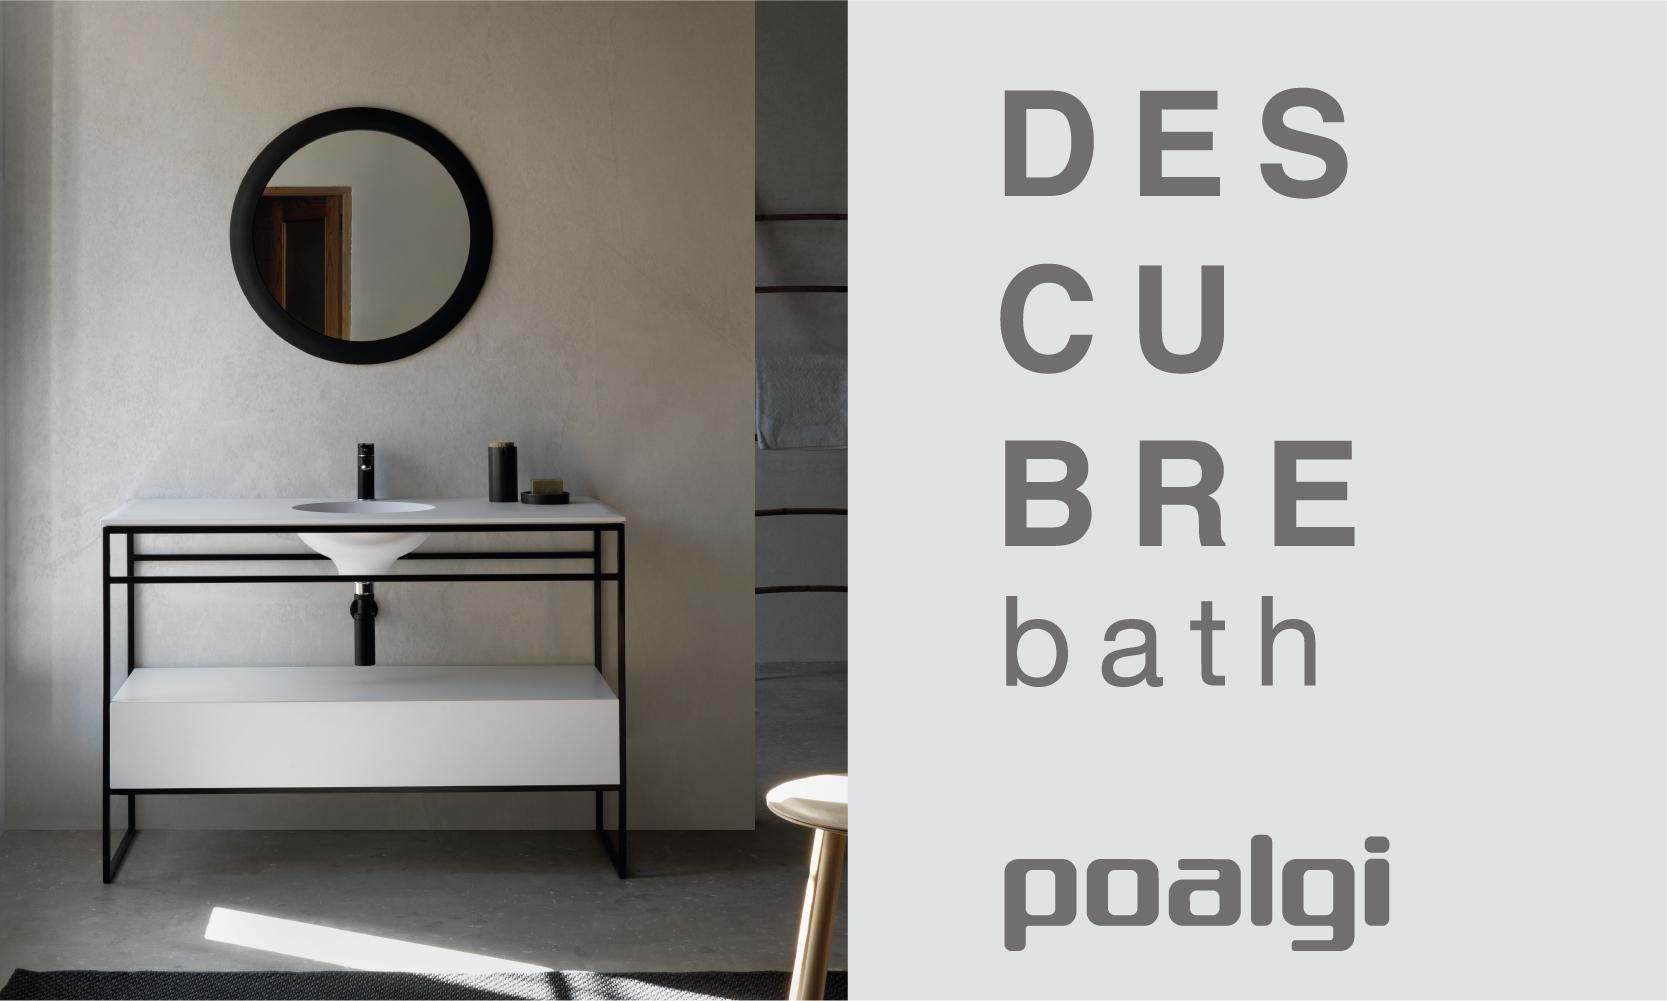 Poalgi Bath